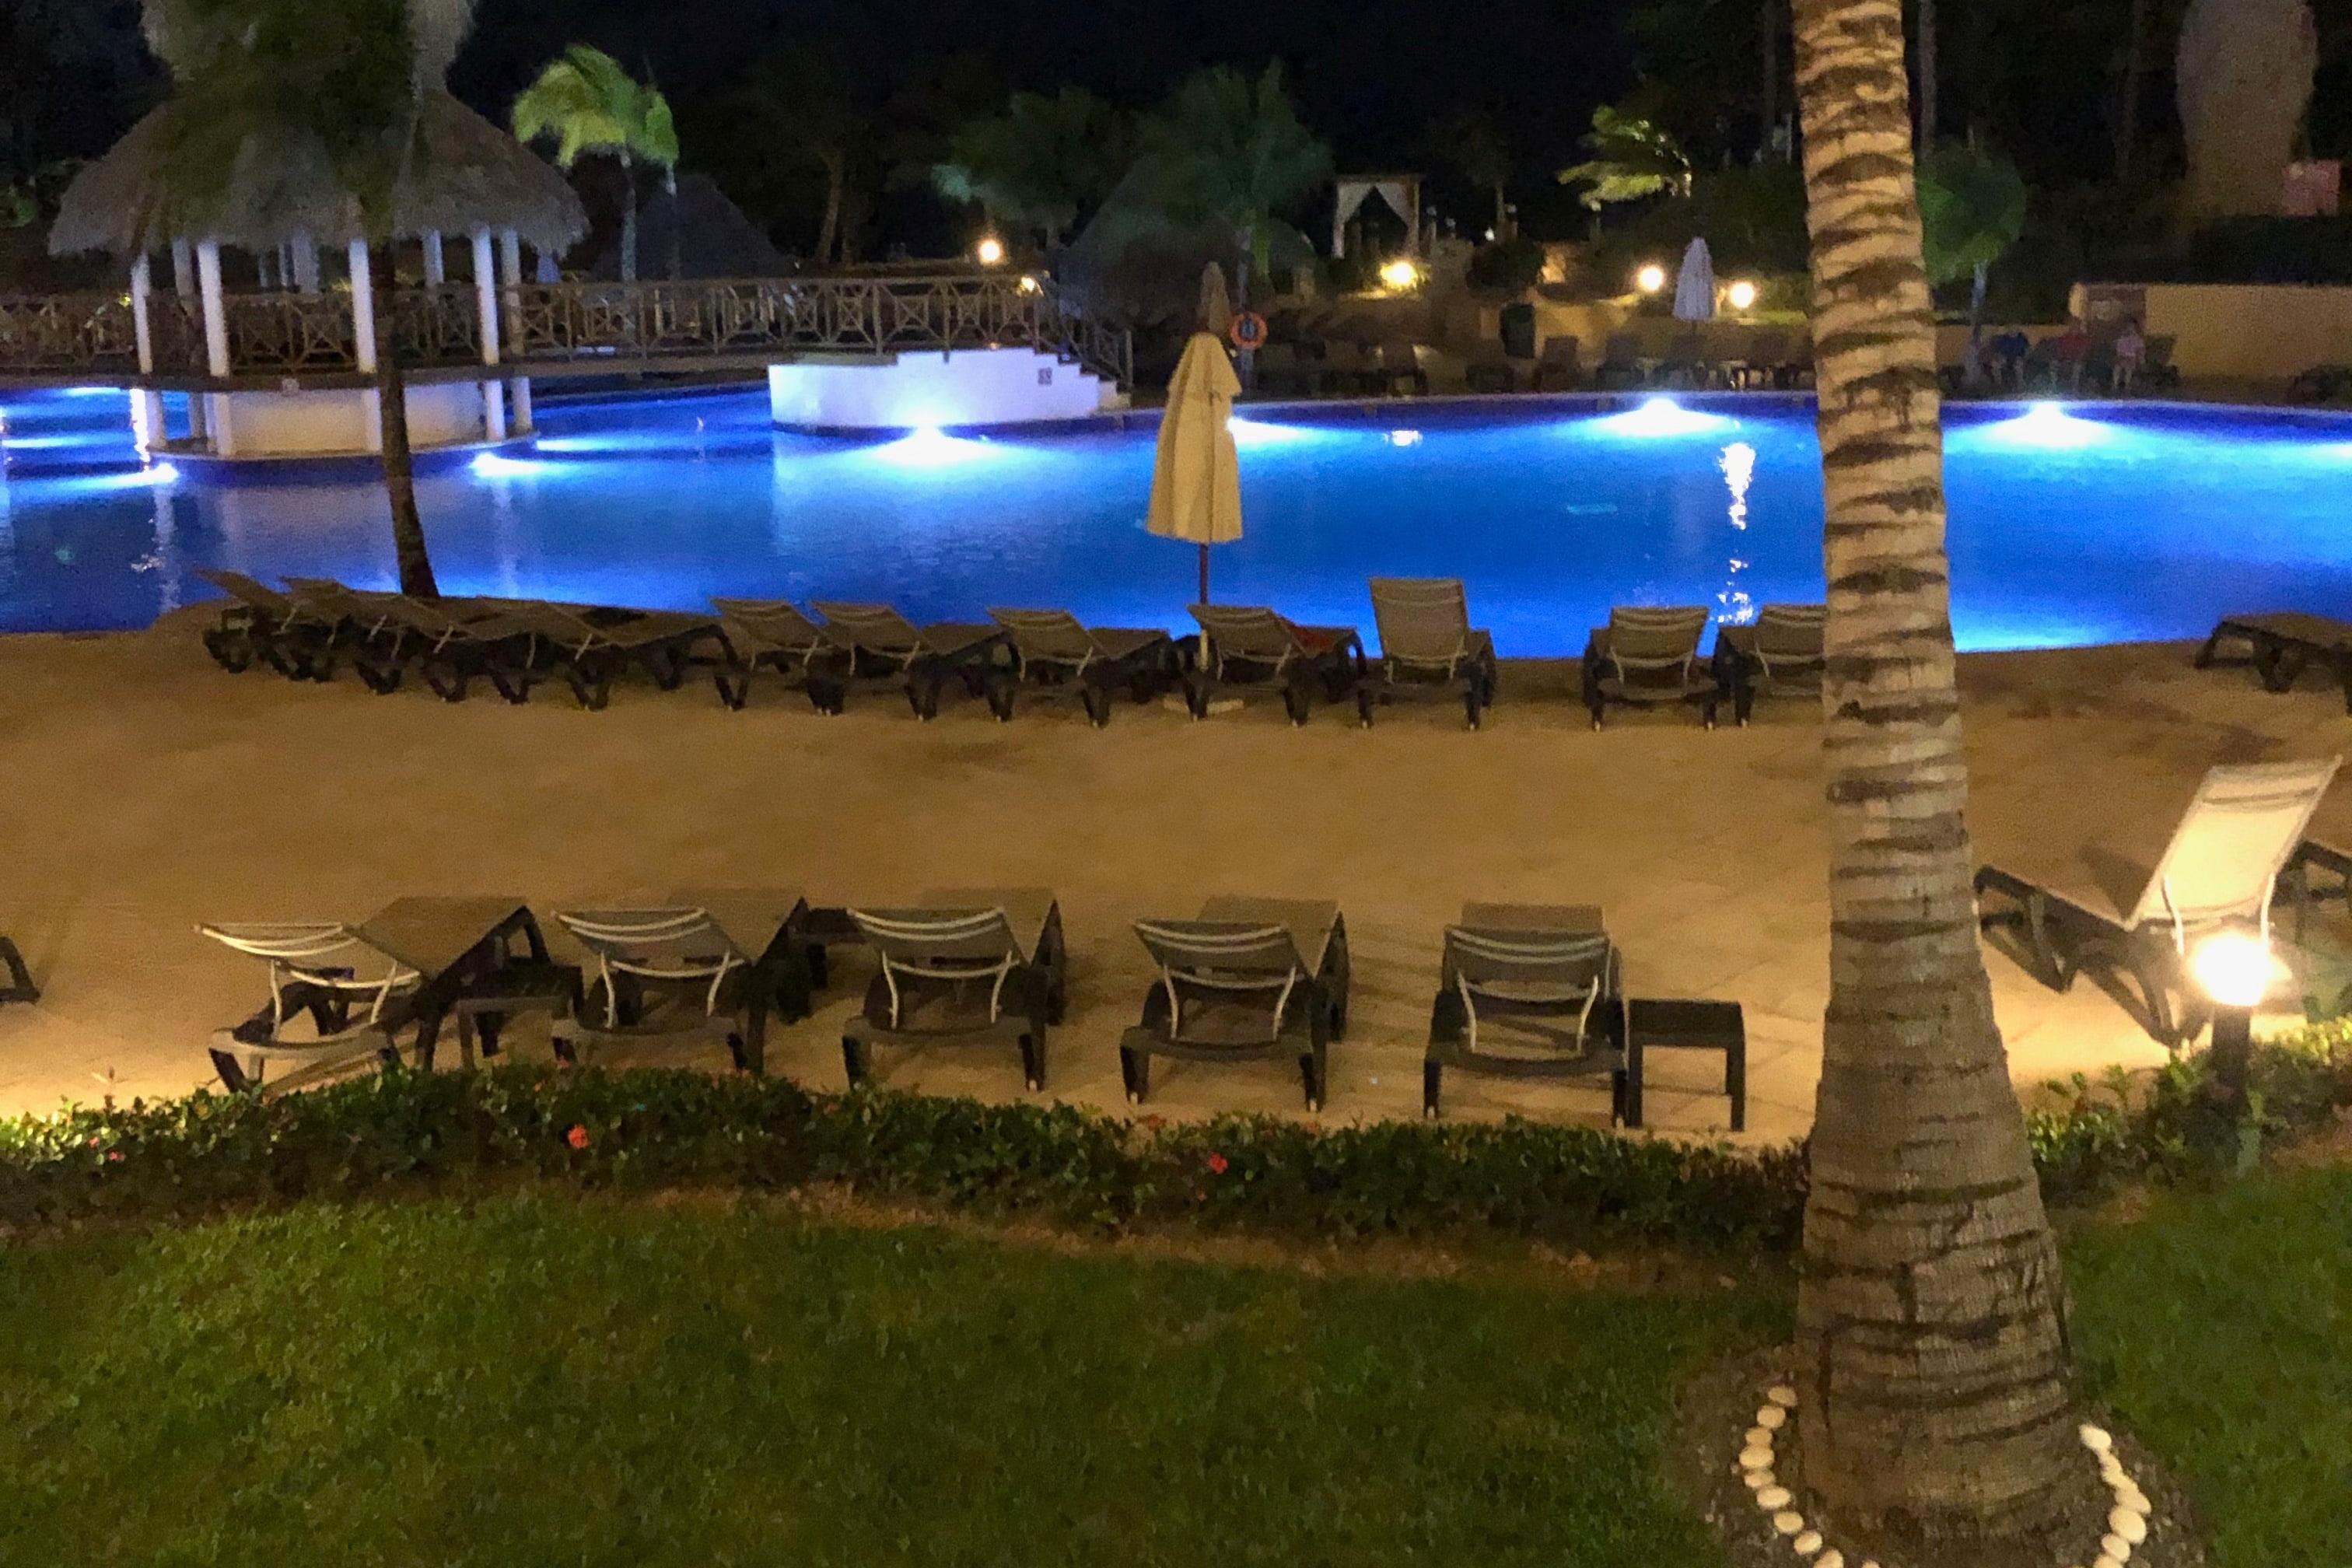 Pool at Resort in Dominican Republic at Night